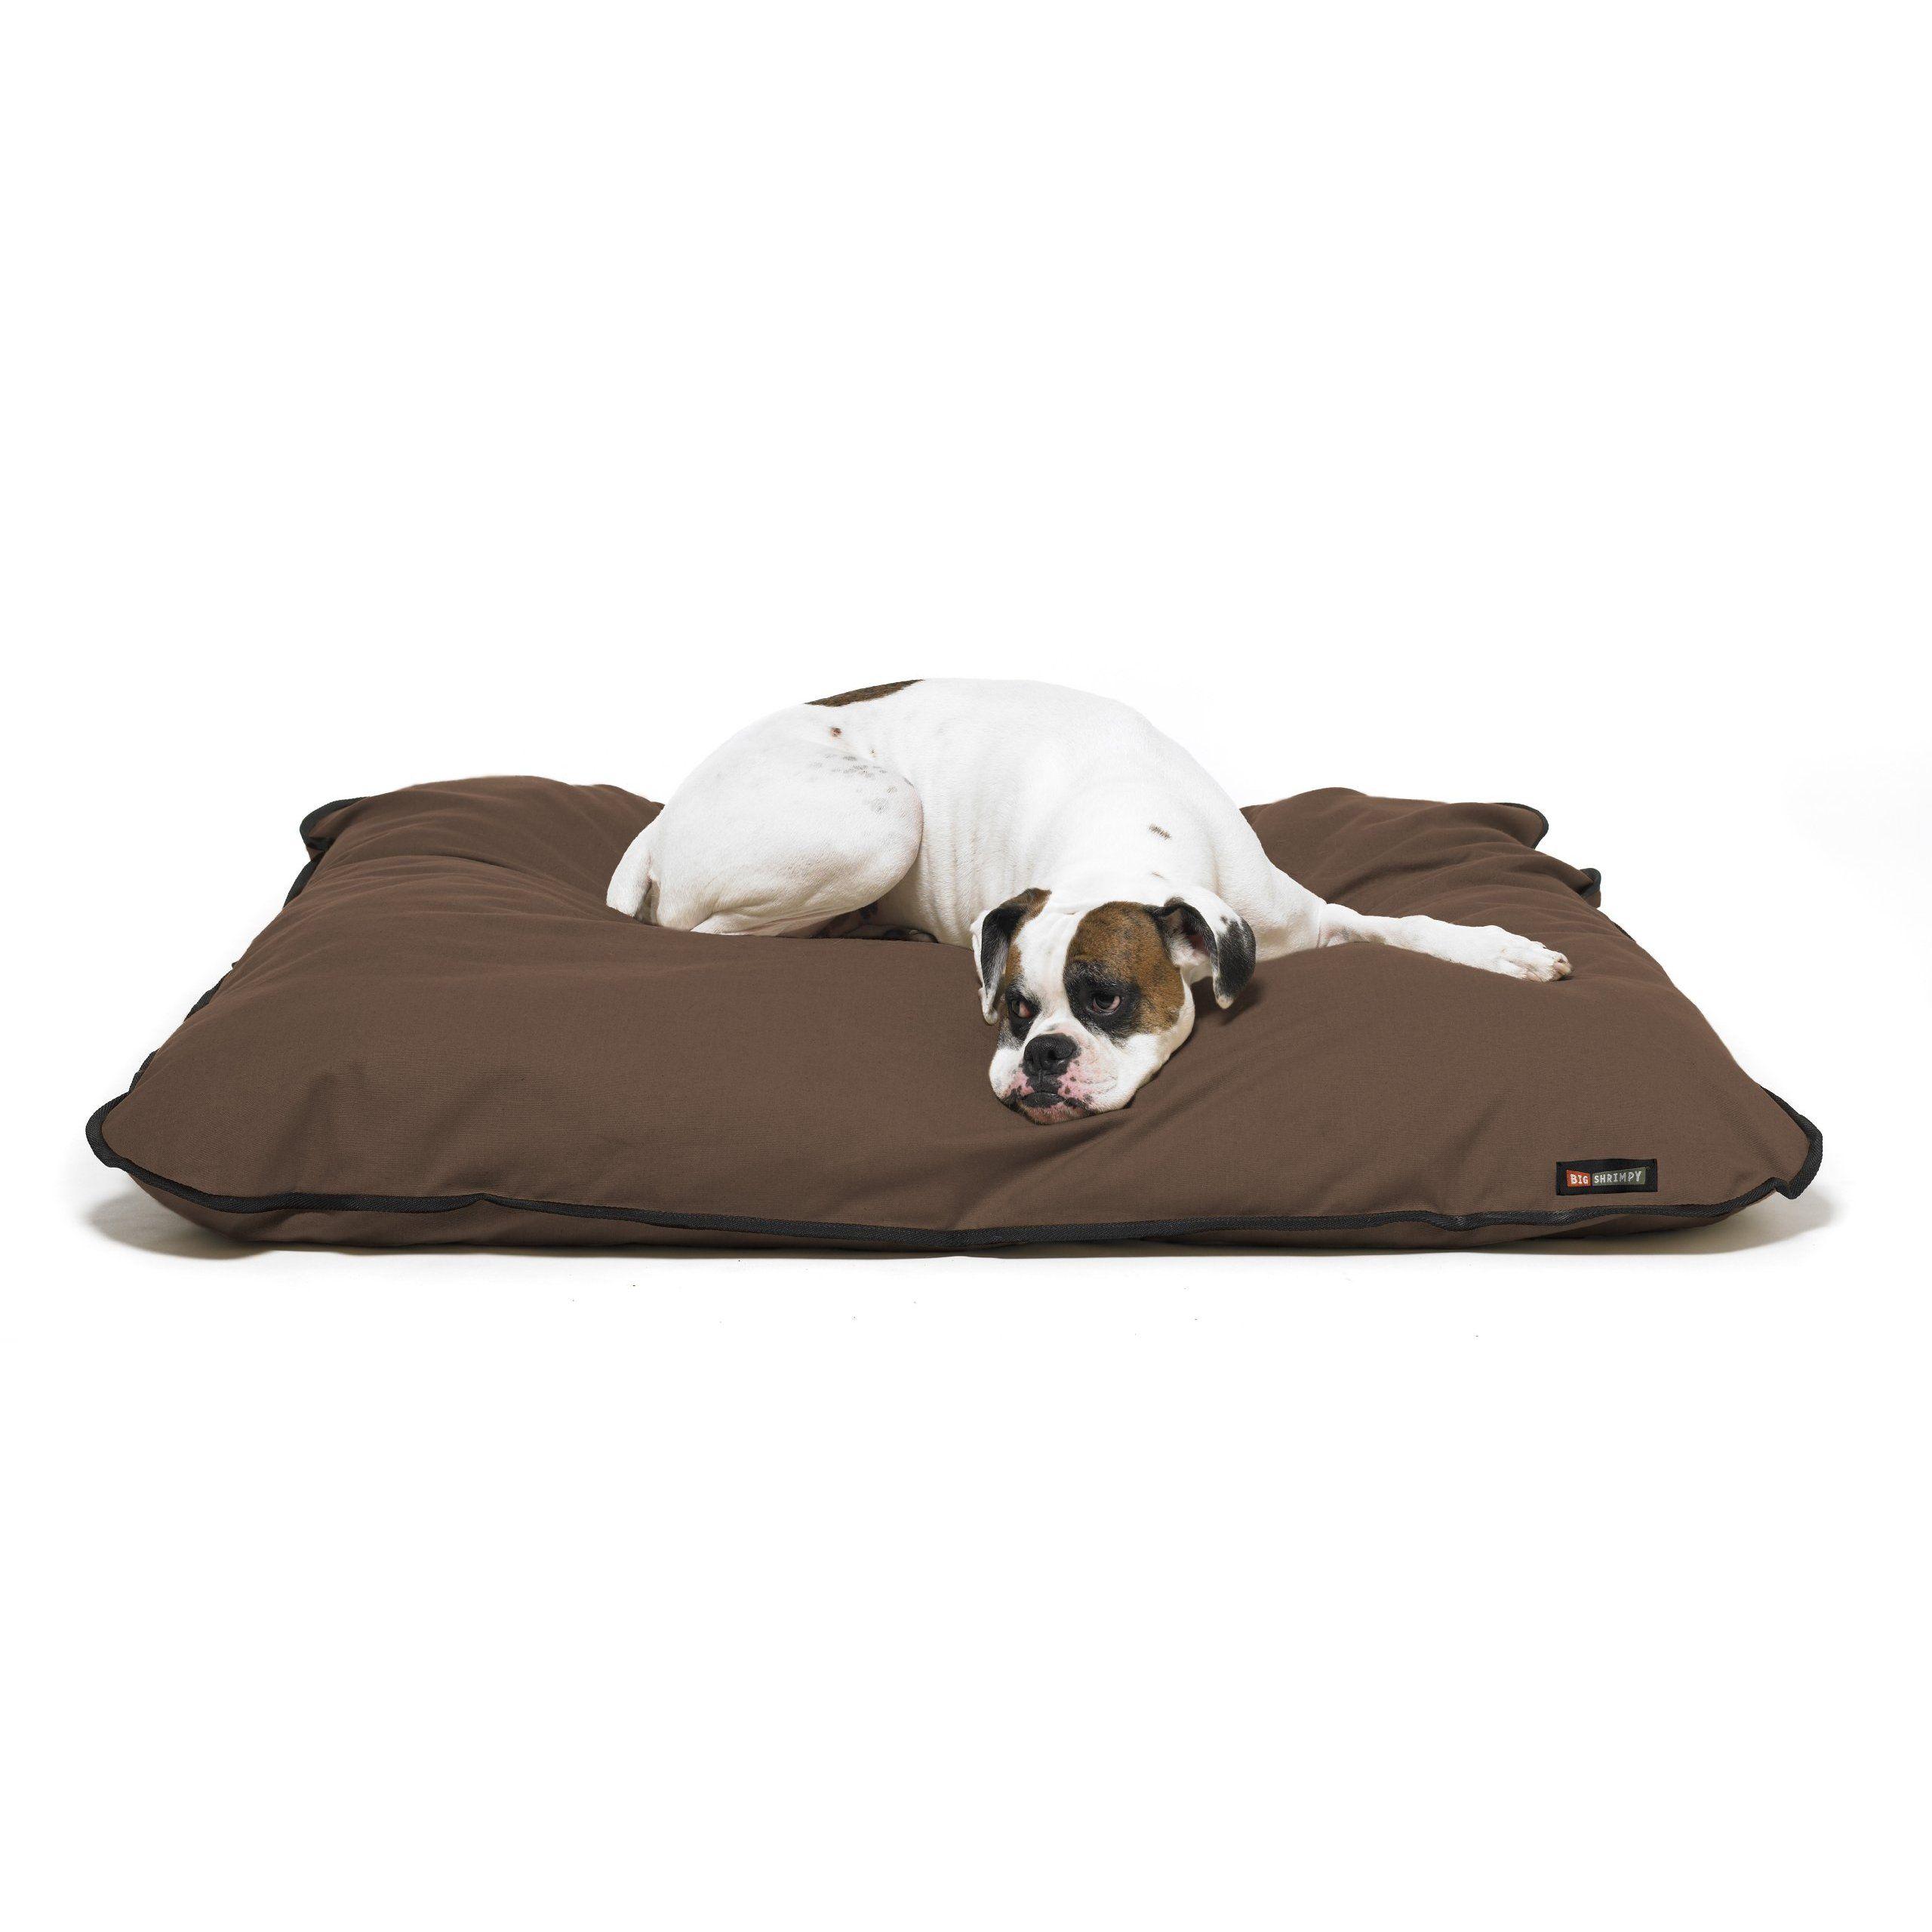 Big Shrimpy Basic Dog Bed Fluffy Dog Bed ) (With images